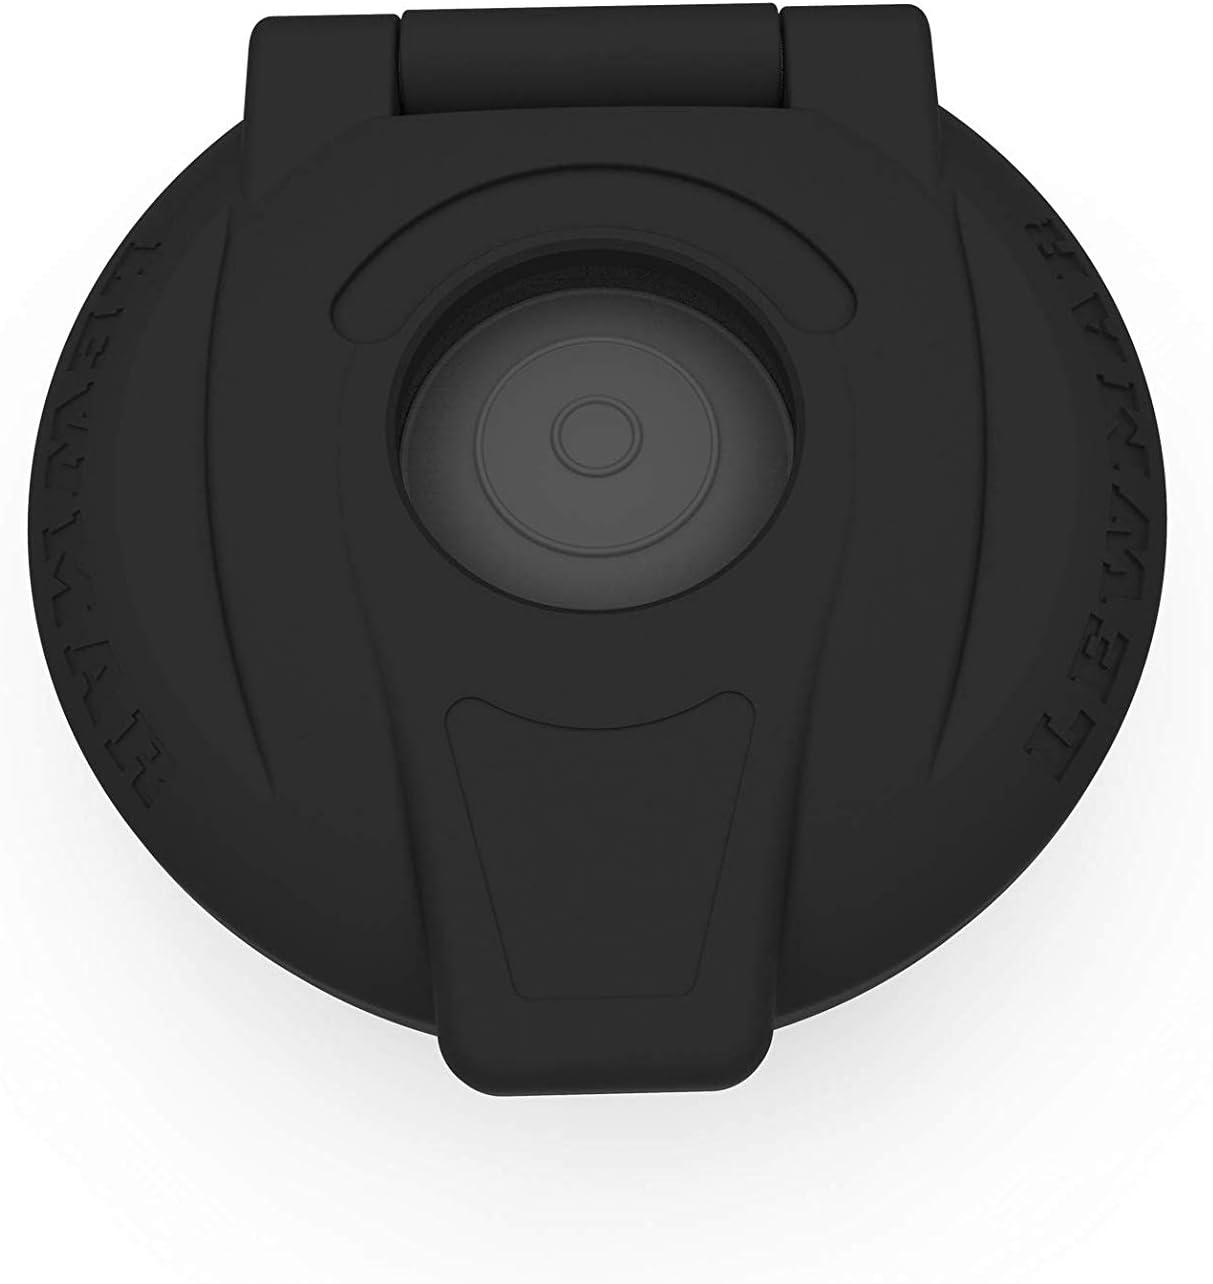 Lewmar Switch-Windlass CHSX Foot Tucson Mall Open High material 6800125 Model: Black Top